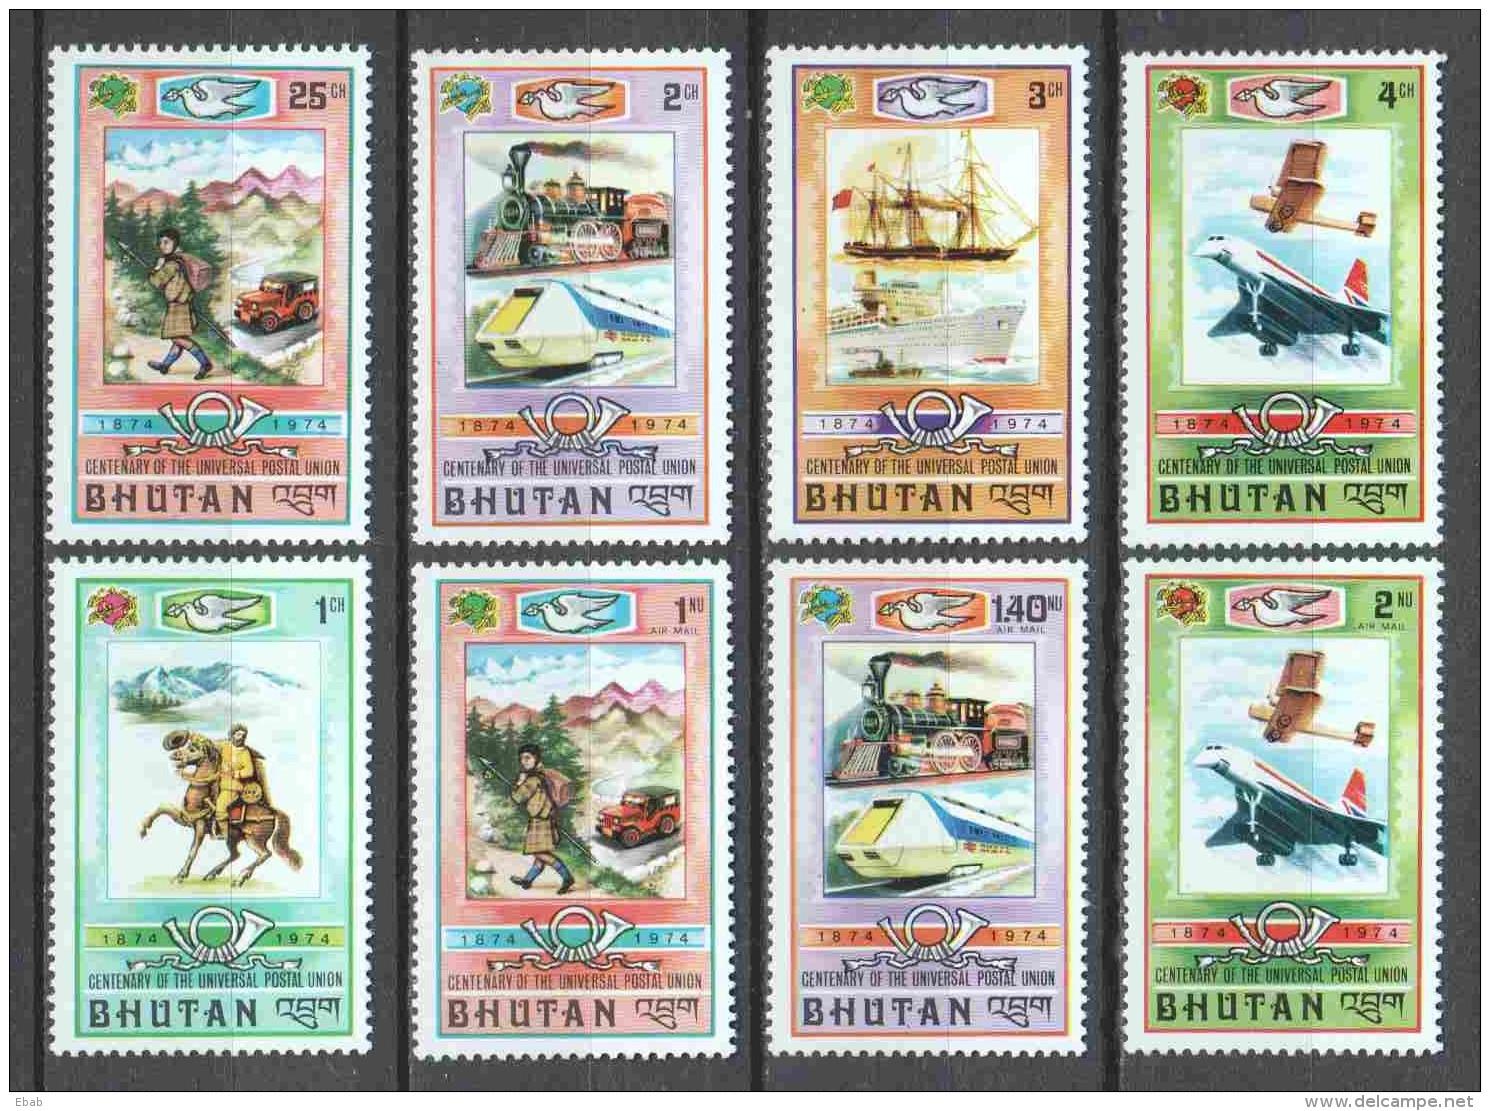 Barbuda 1974 Mi 592-599 MNH UPU - UPU (Union Postale Universelle)